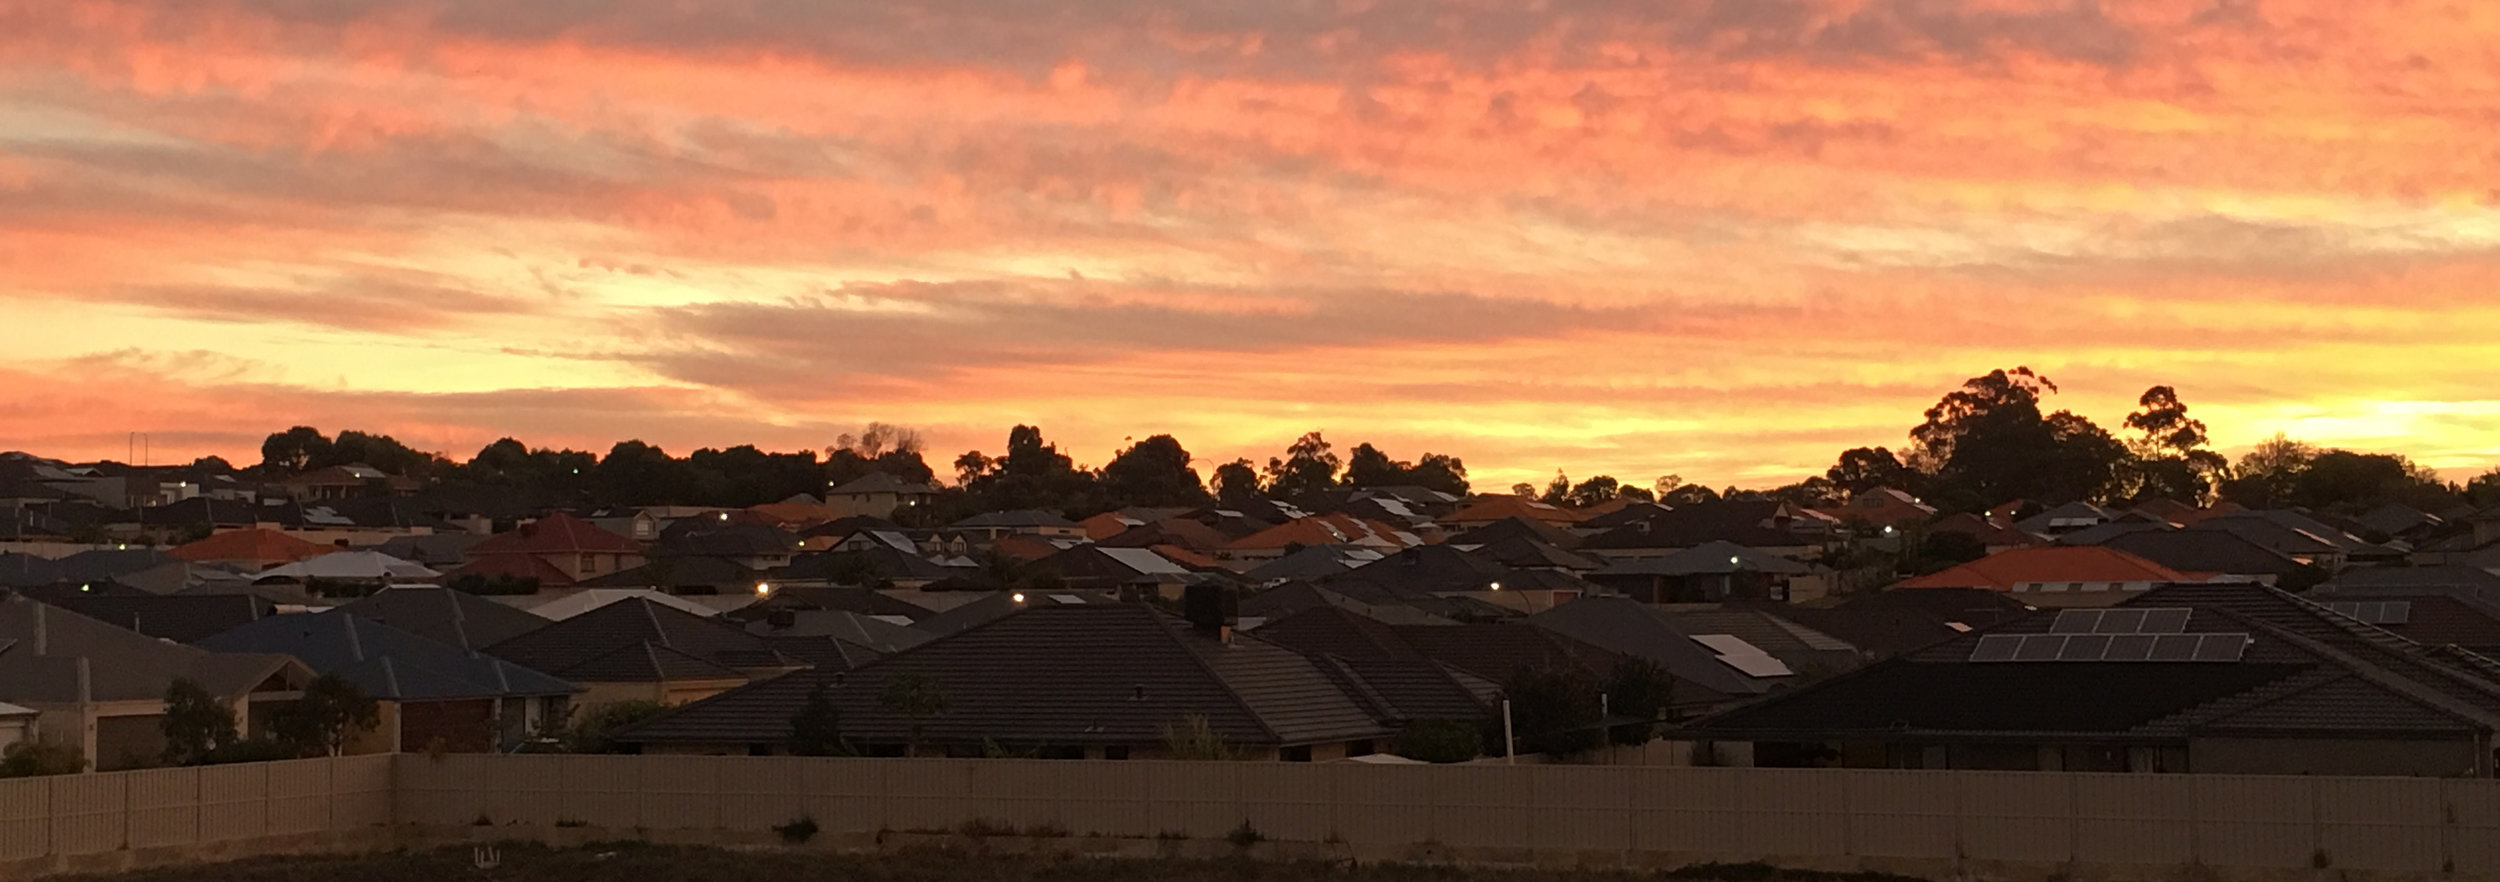 Suburban sprawl in northern Perth